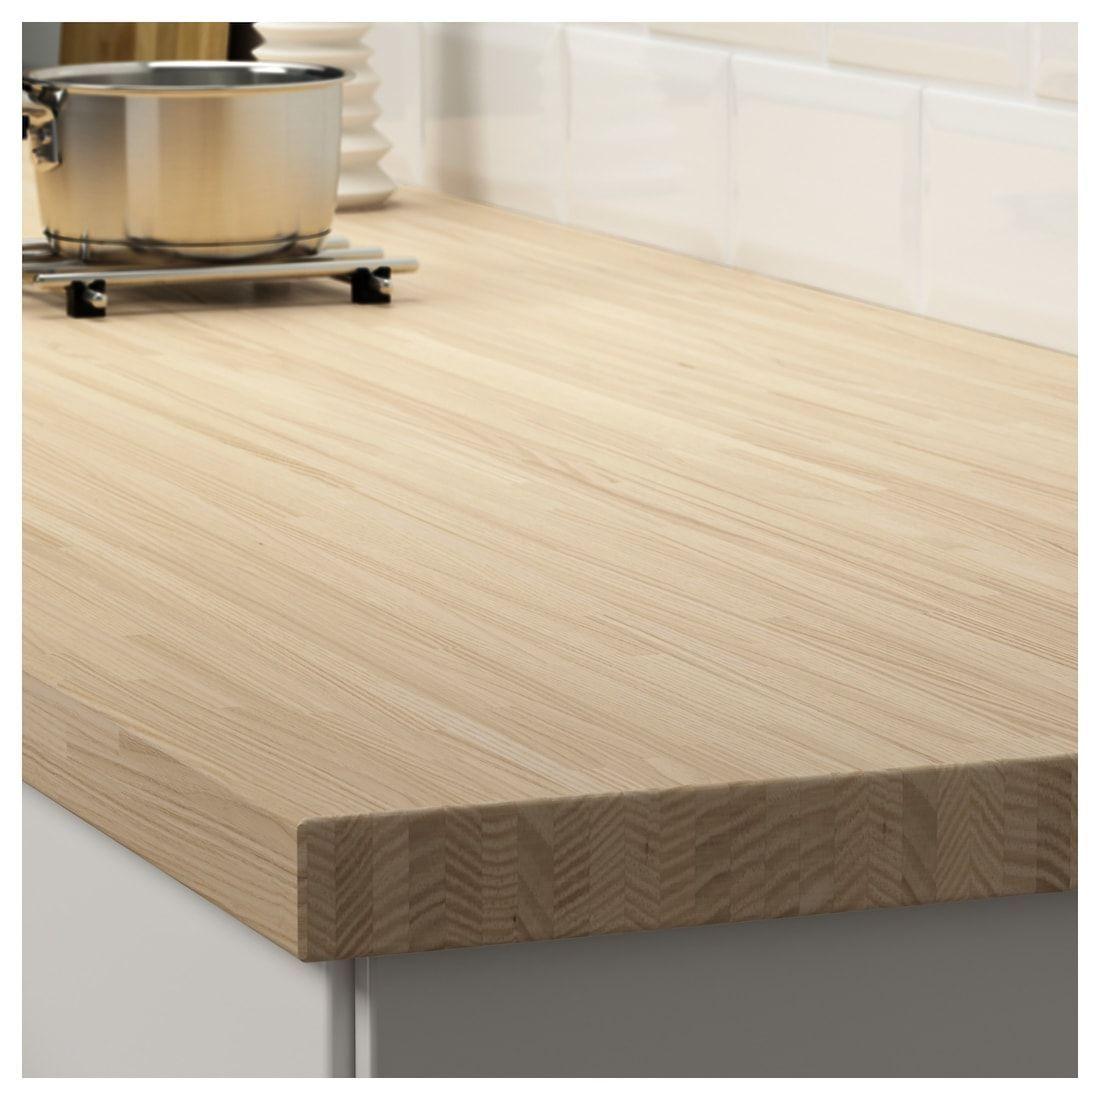 Pinnarp Countertop Ash Ikea Arbeitsplatte Arbeitsflachen Moderne Bodenbelage